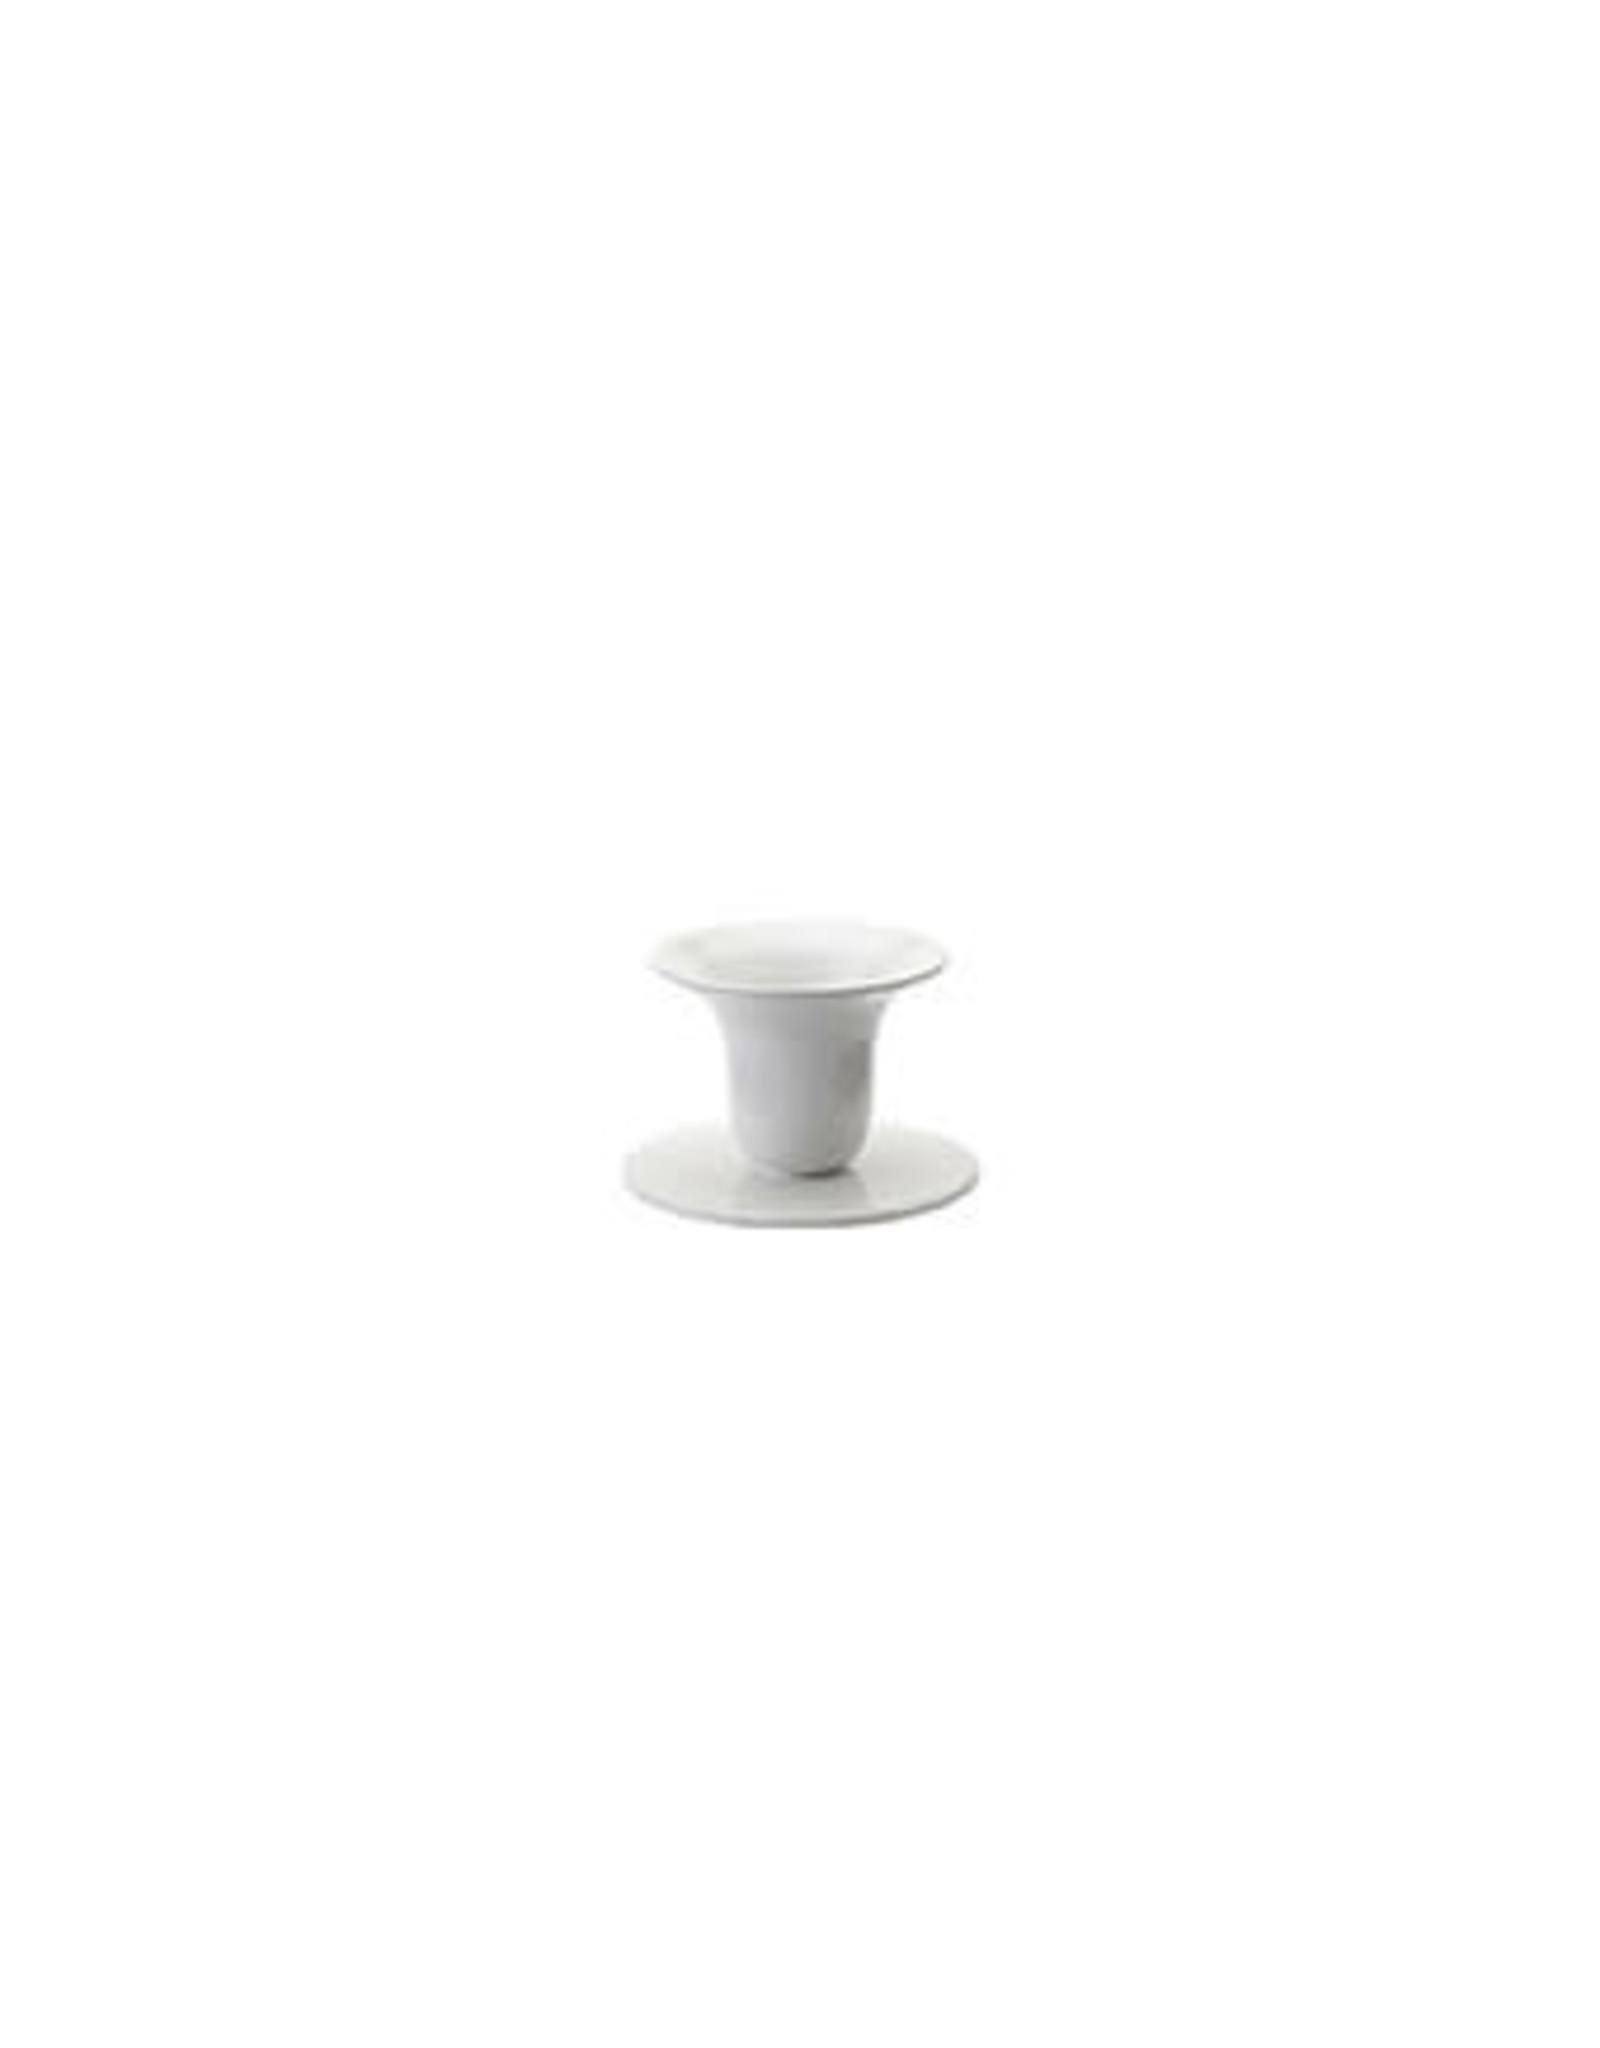 Kunst industrien The Bell Candlestick, White    H 5cm dia 2,3cm